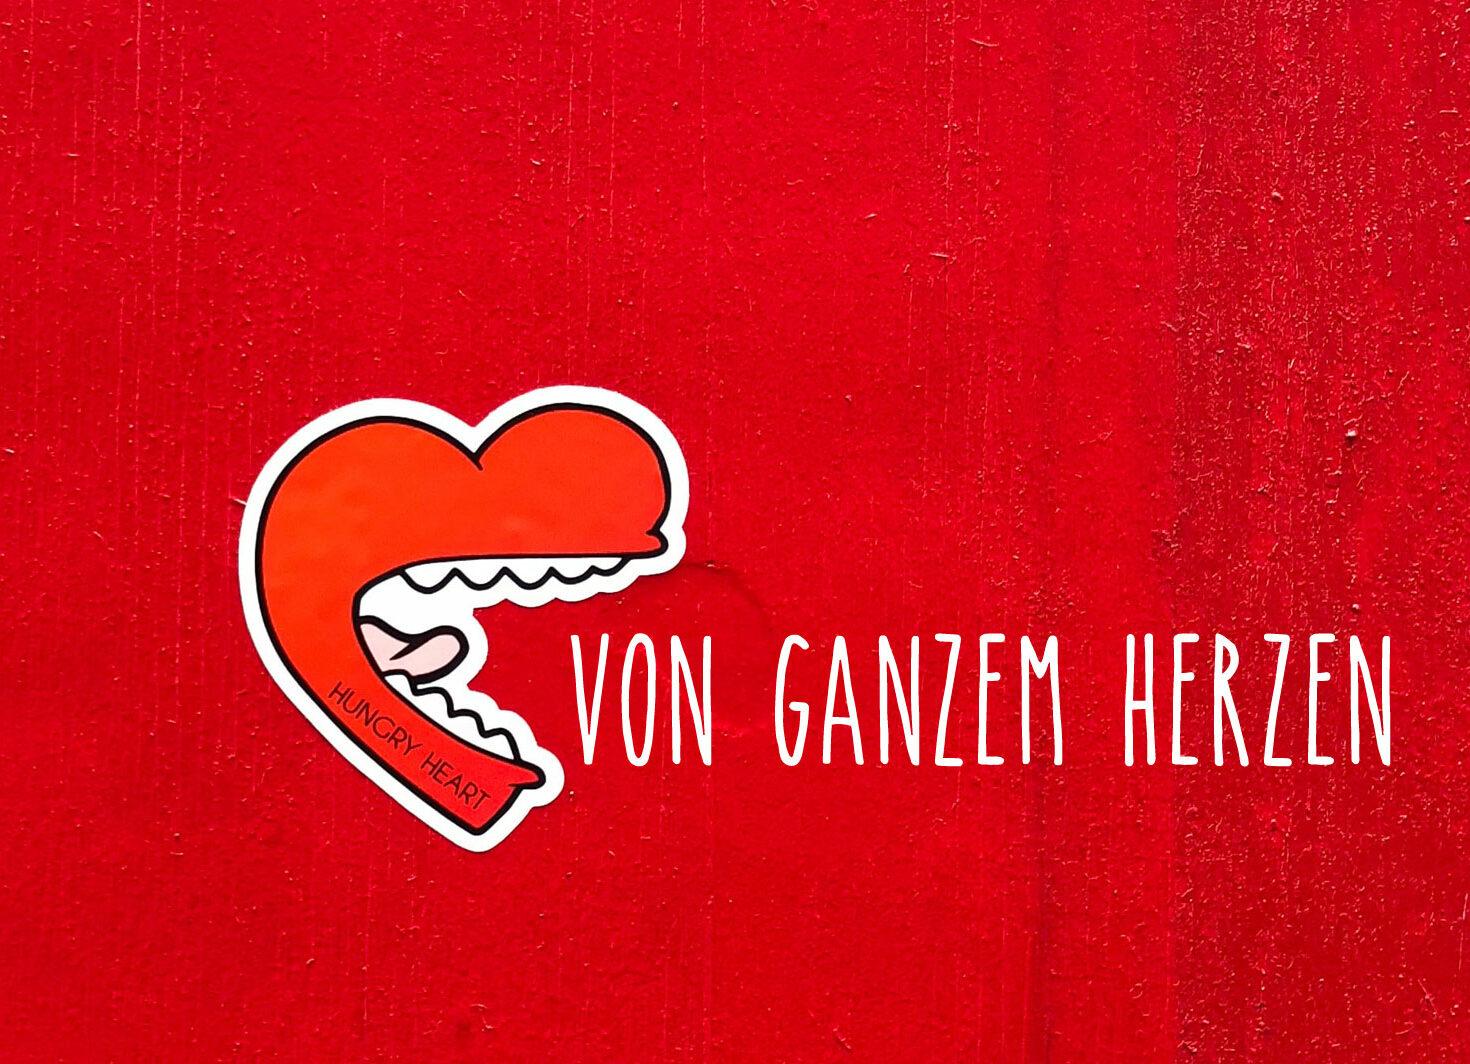 Herzensprojekte Spenden Photo-by-Jon-Tyson-on-Unsplash